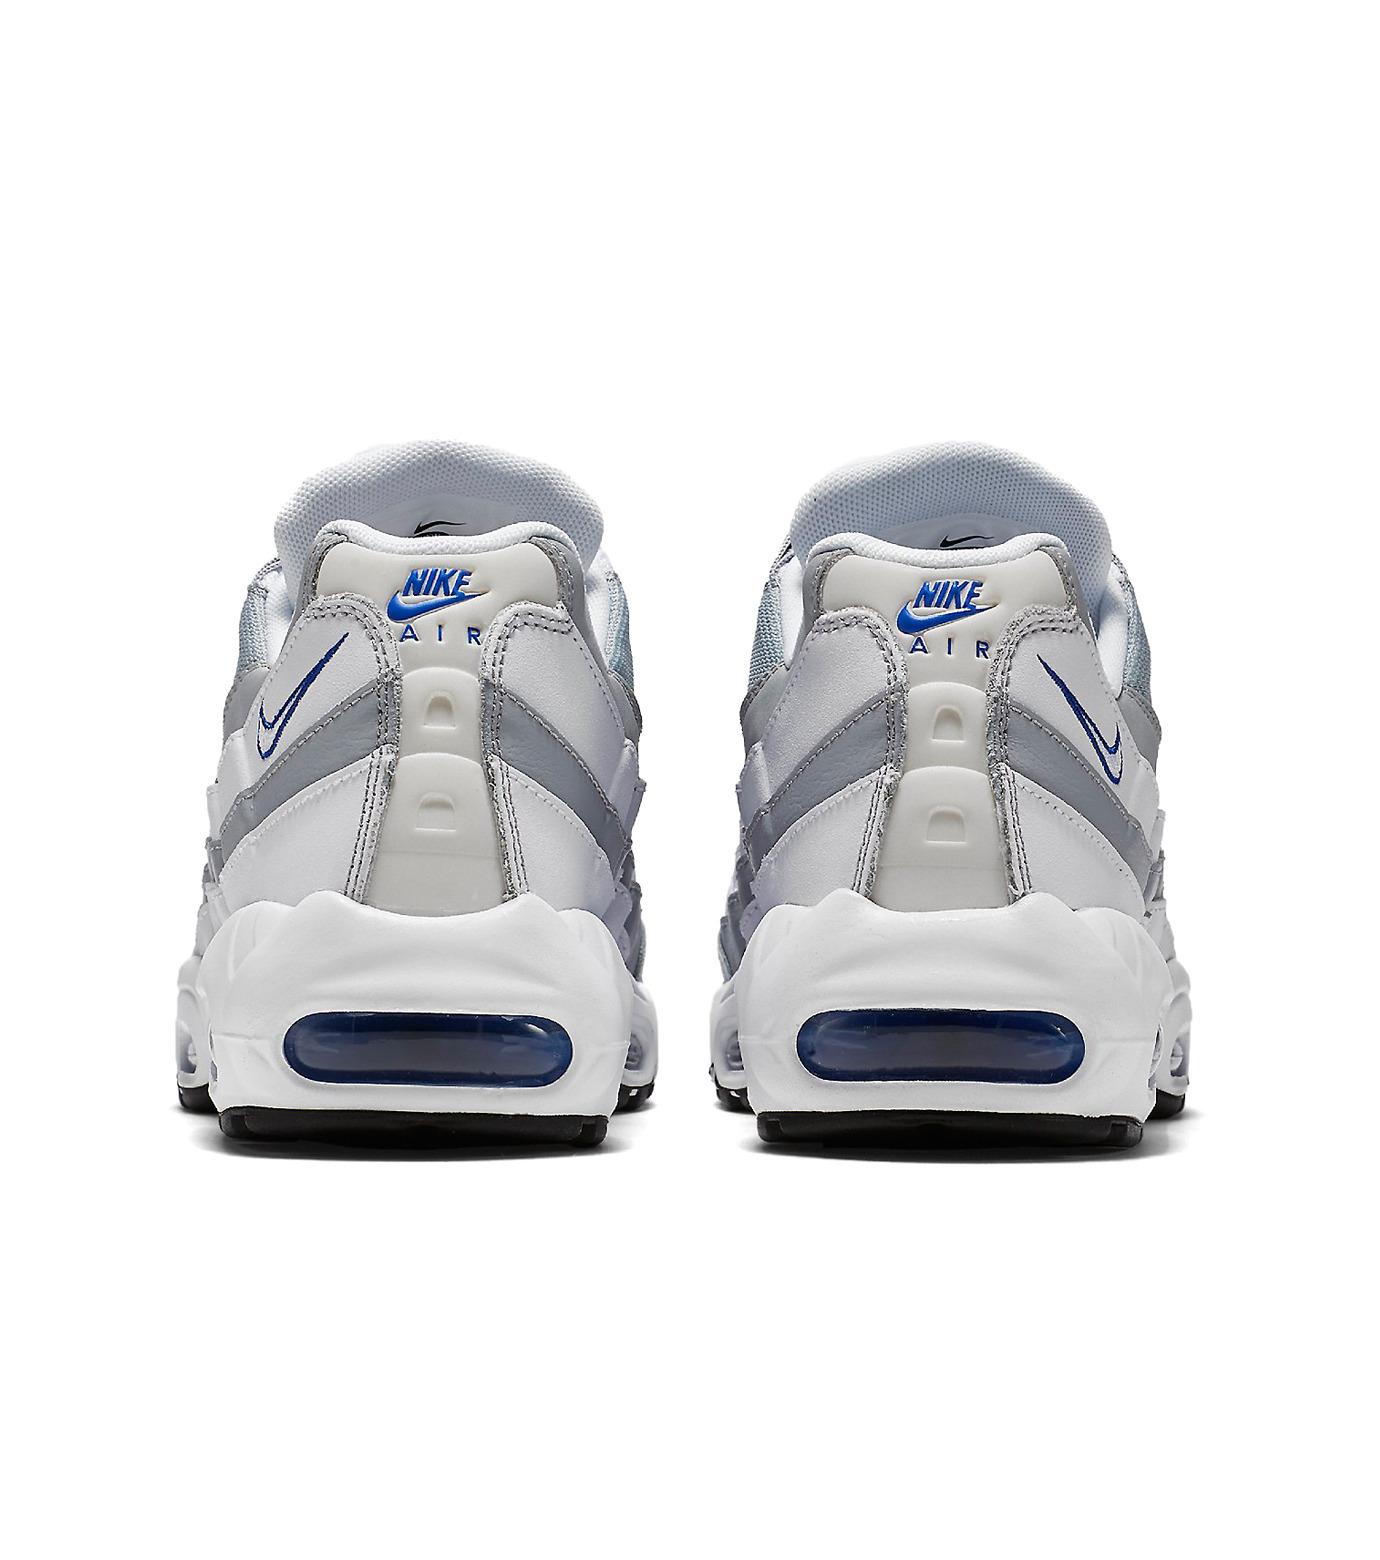 NIKE(ナイキ)のAIR MAX 95 ESSENTIAL-WHITE(シューズ/shoes)-749766-104-4 拡大詳細画像5